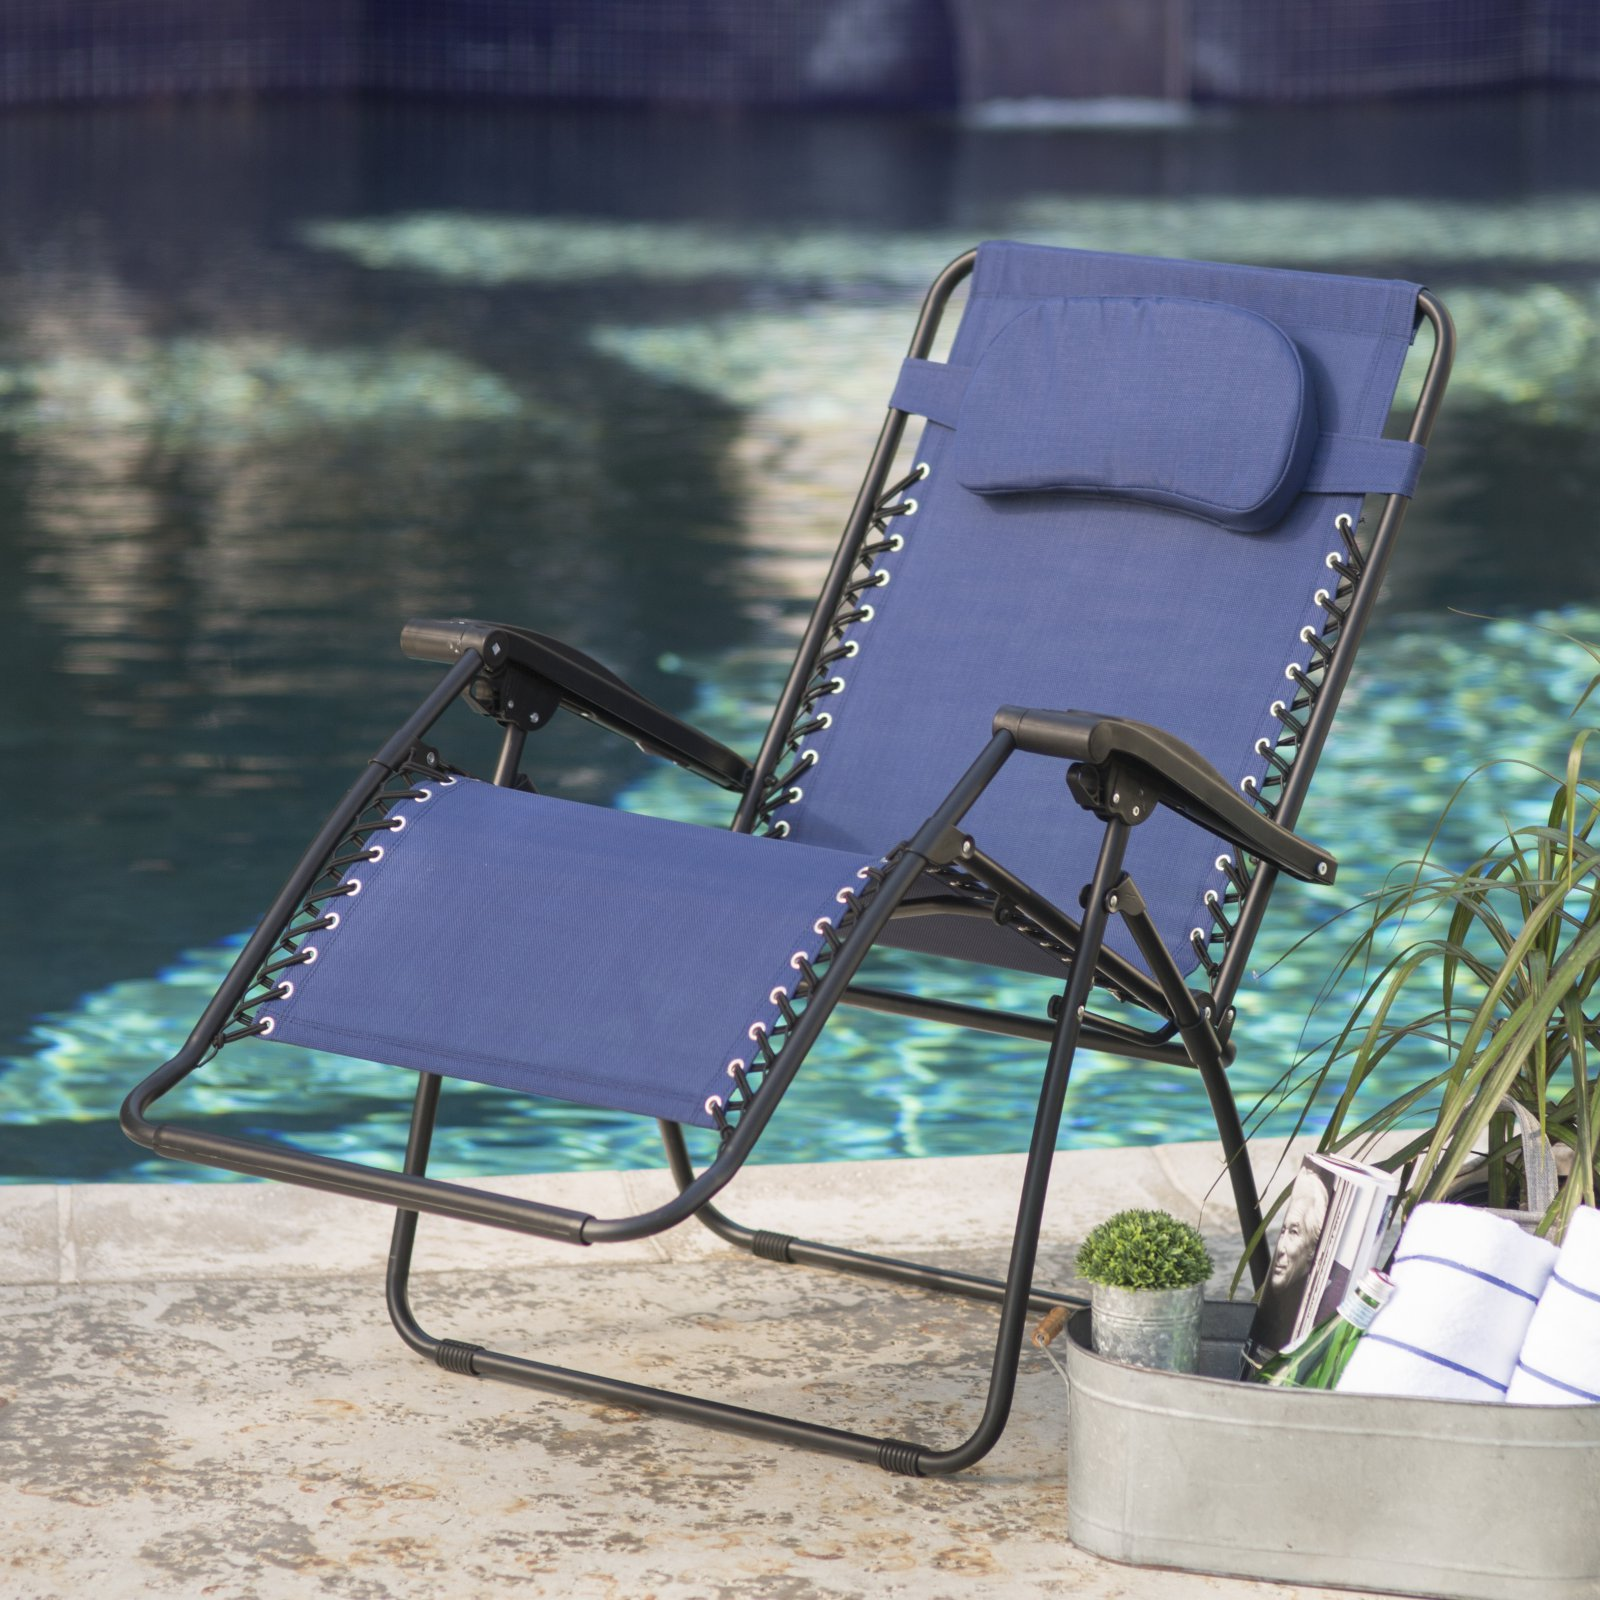 zero gravity chair walmart Caravan Global Sports Oversized Zero Gravity Chair   Walmart.com zero gravity chair walmart